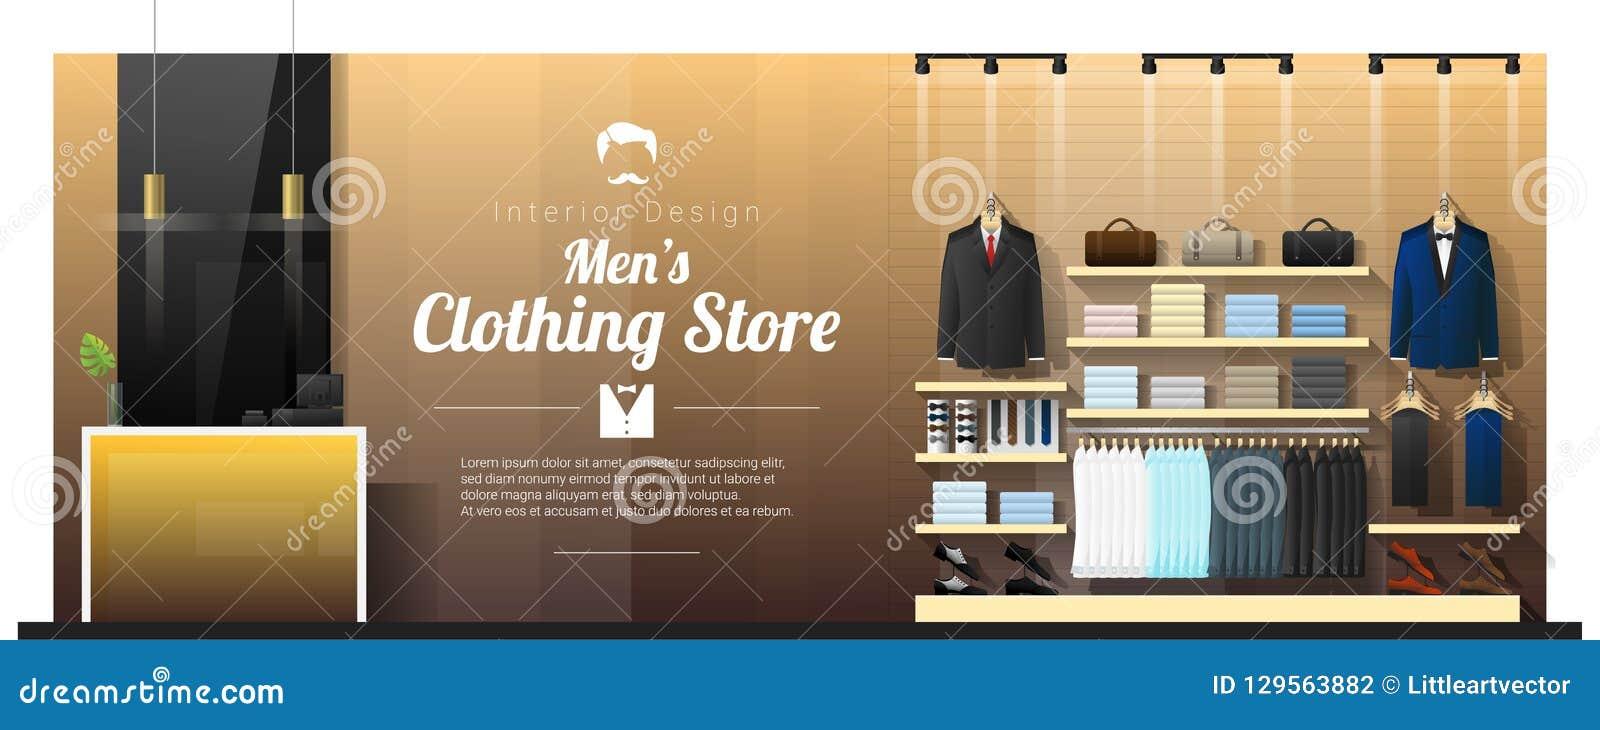 Fundo interior da loja de roupa luxuosa dos homens